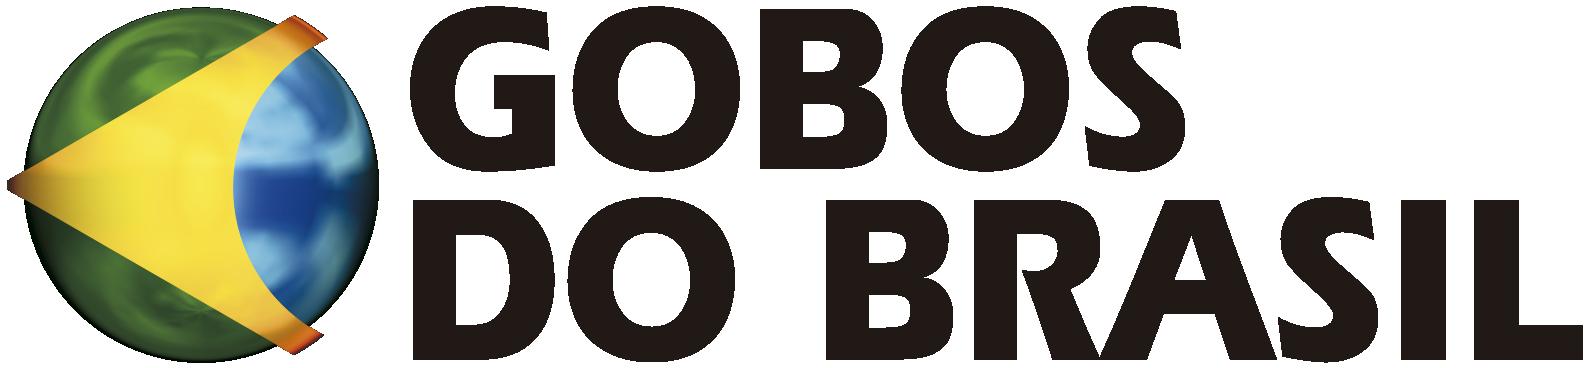 Gobos-do-Brasil_logo